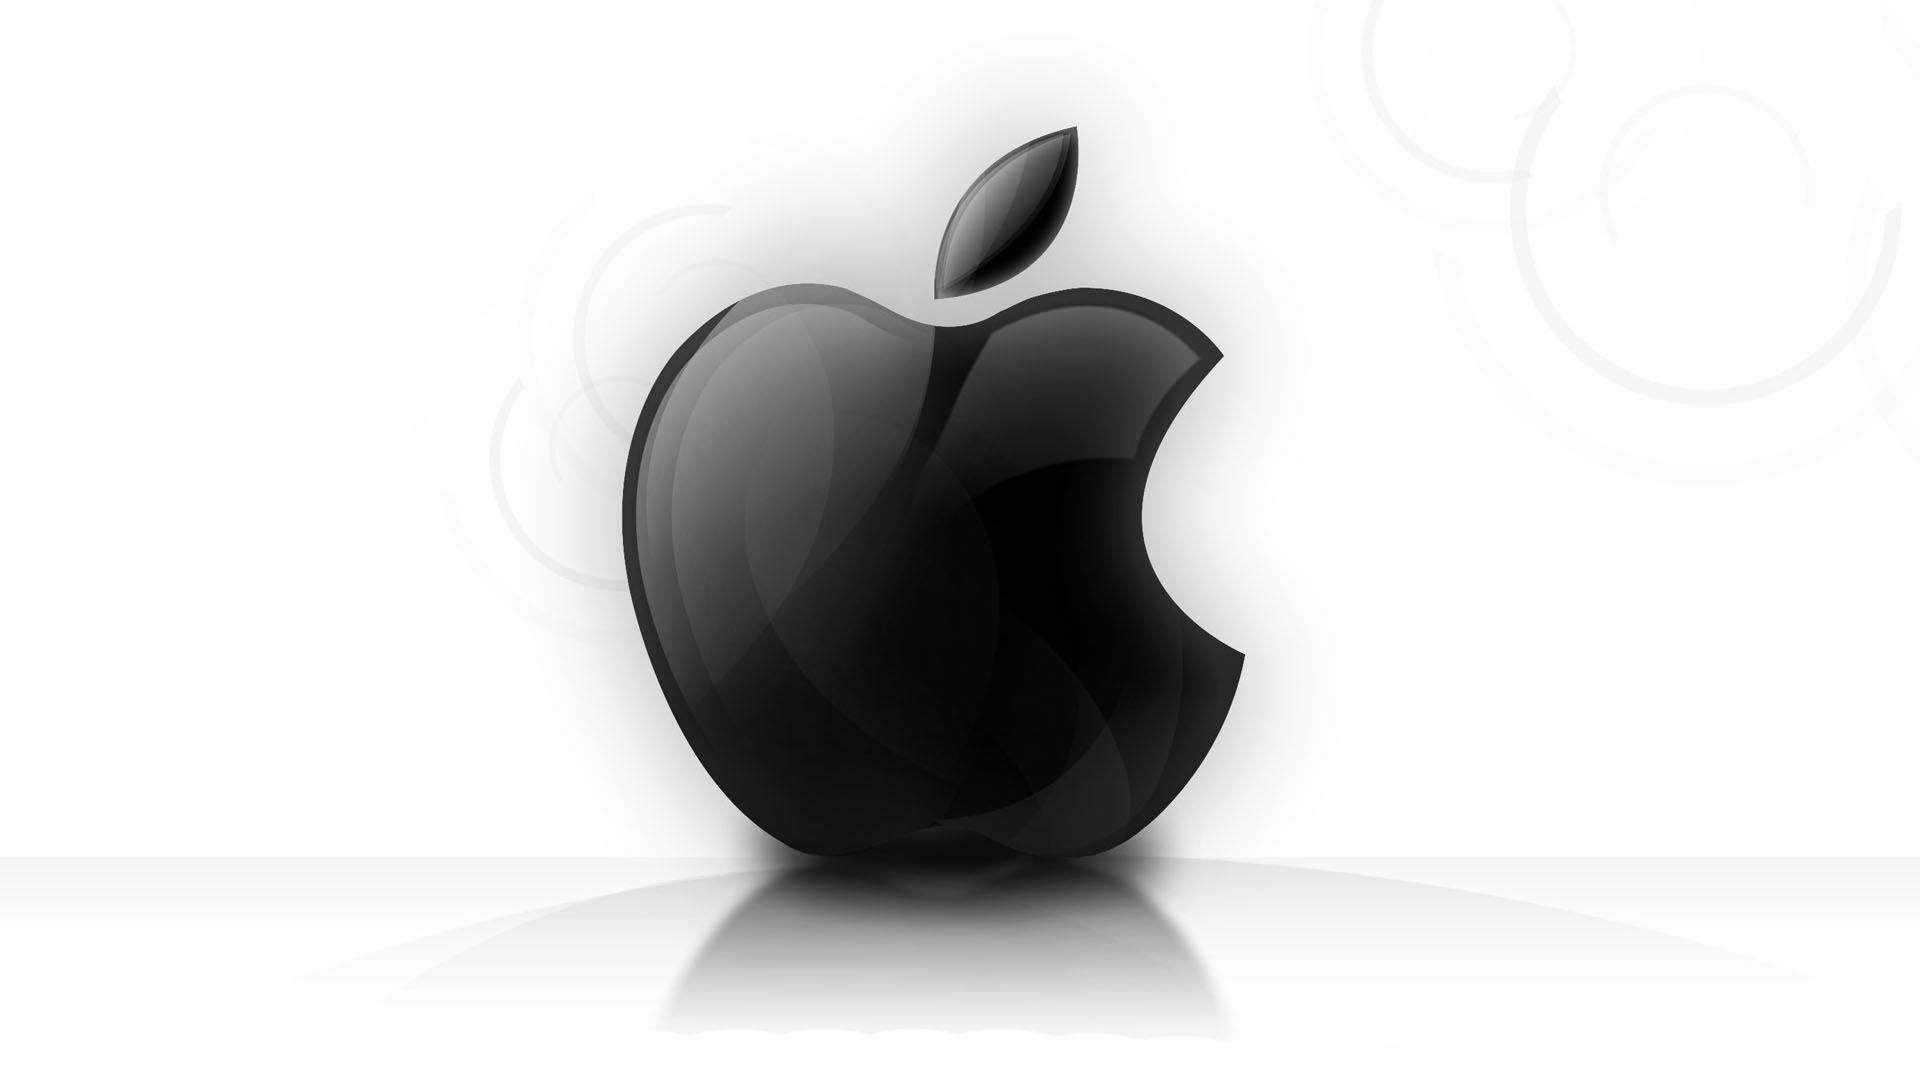 black apple wallpaper hd - photo #42